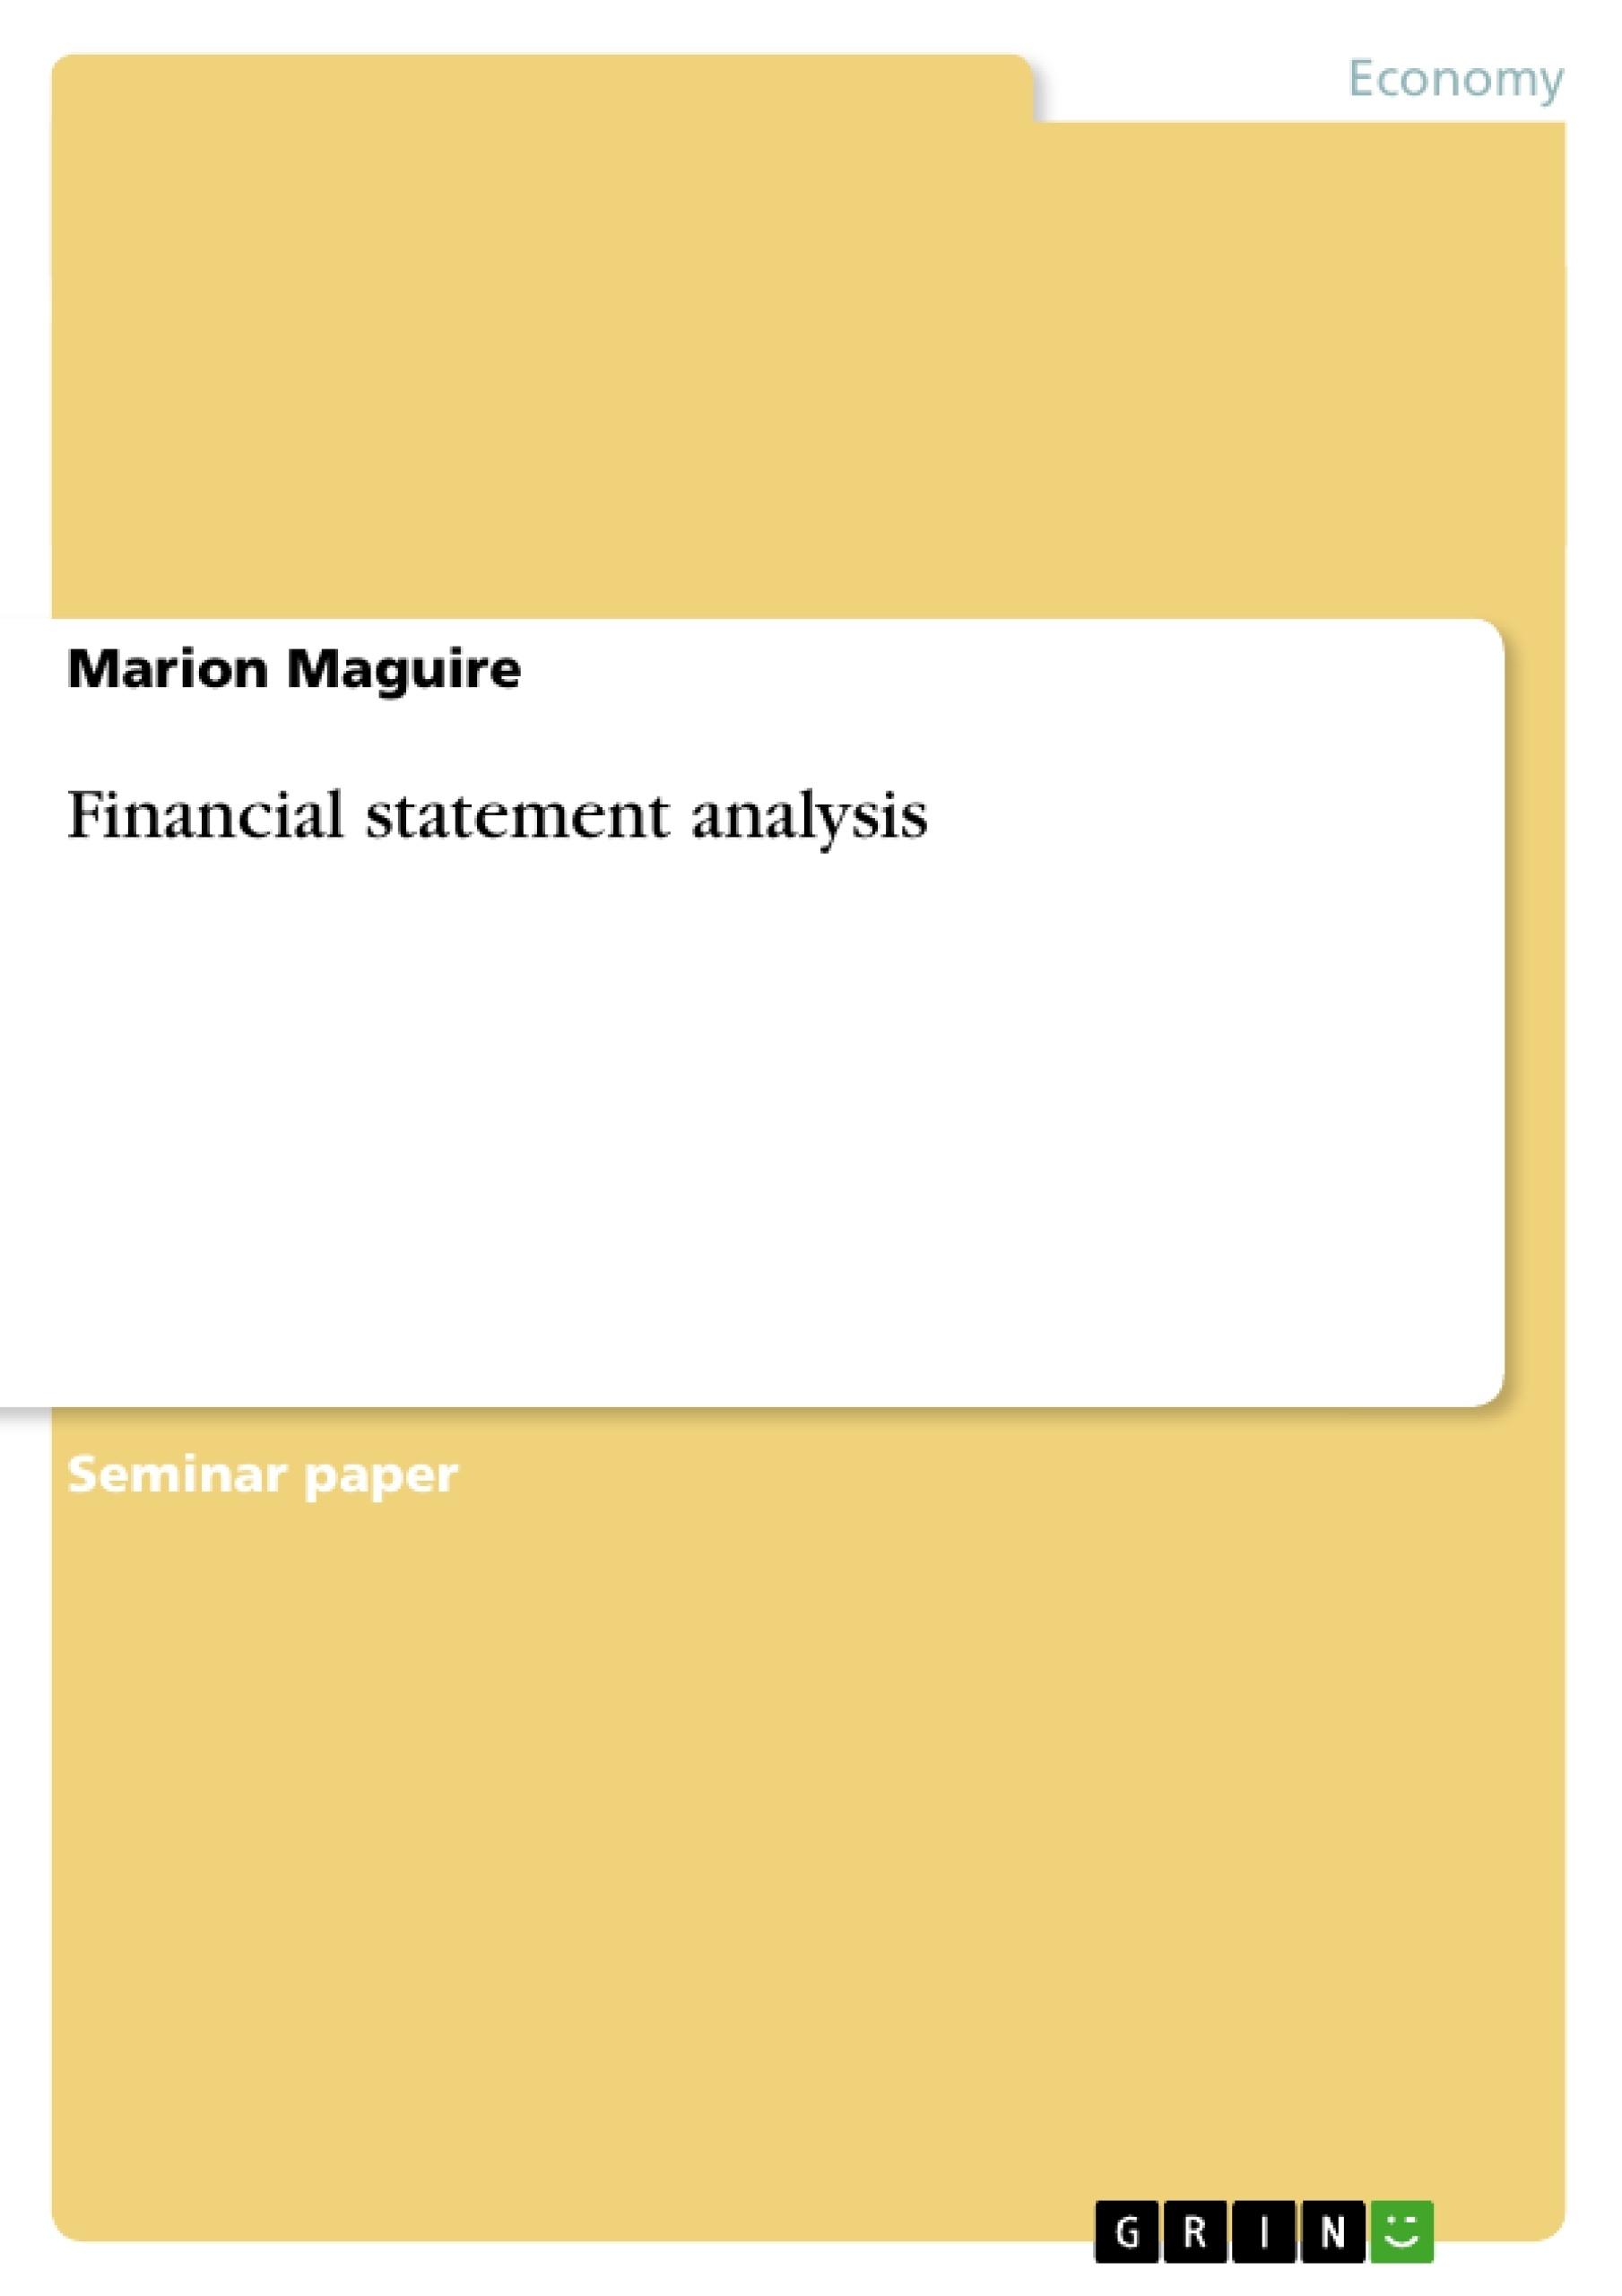 Title: Financial statement analysis